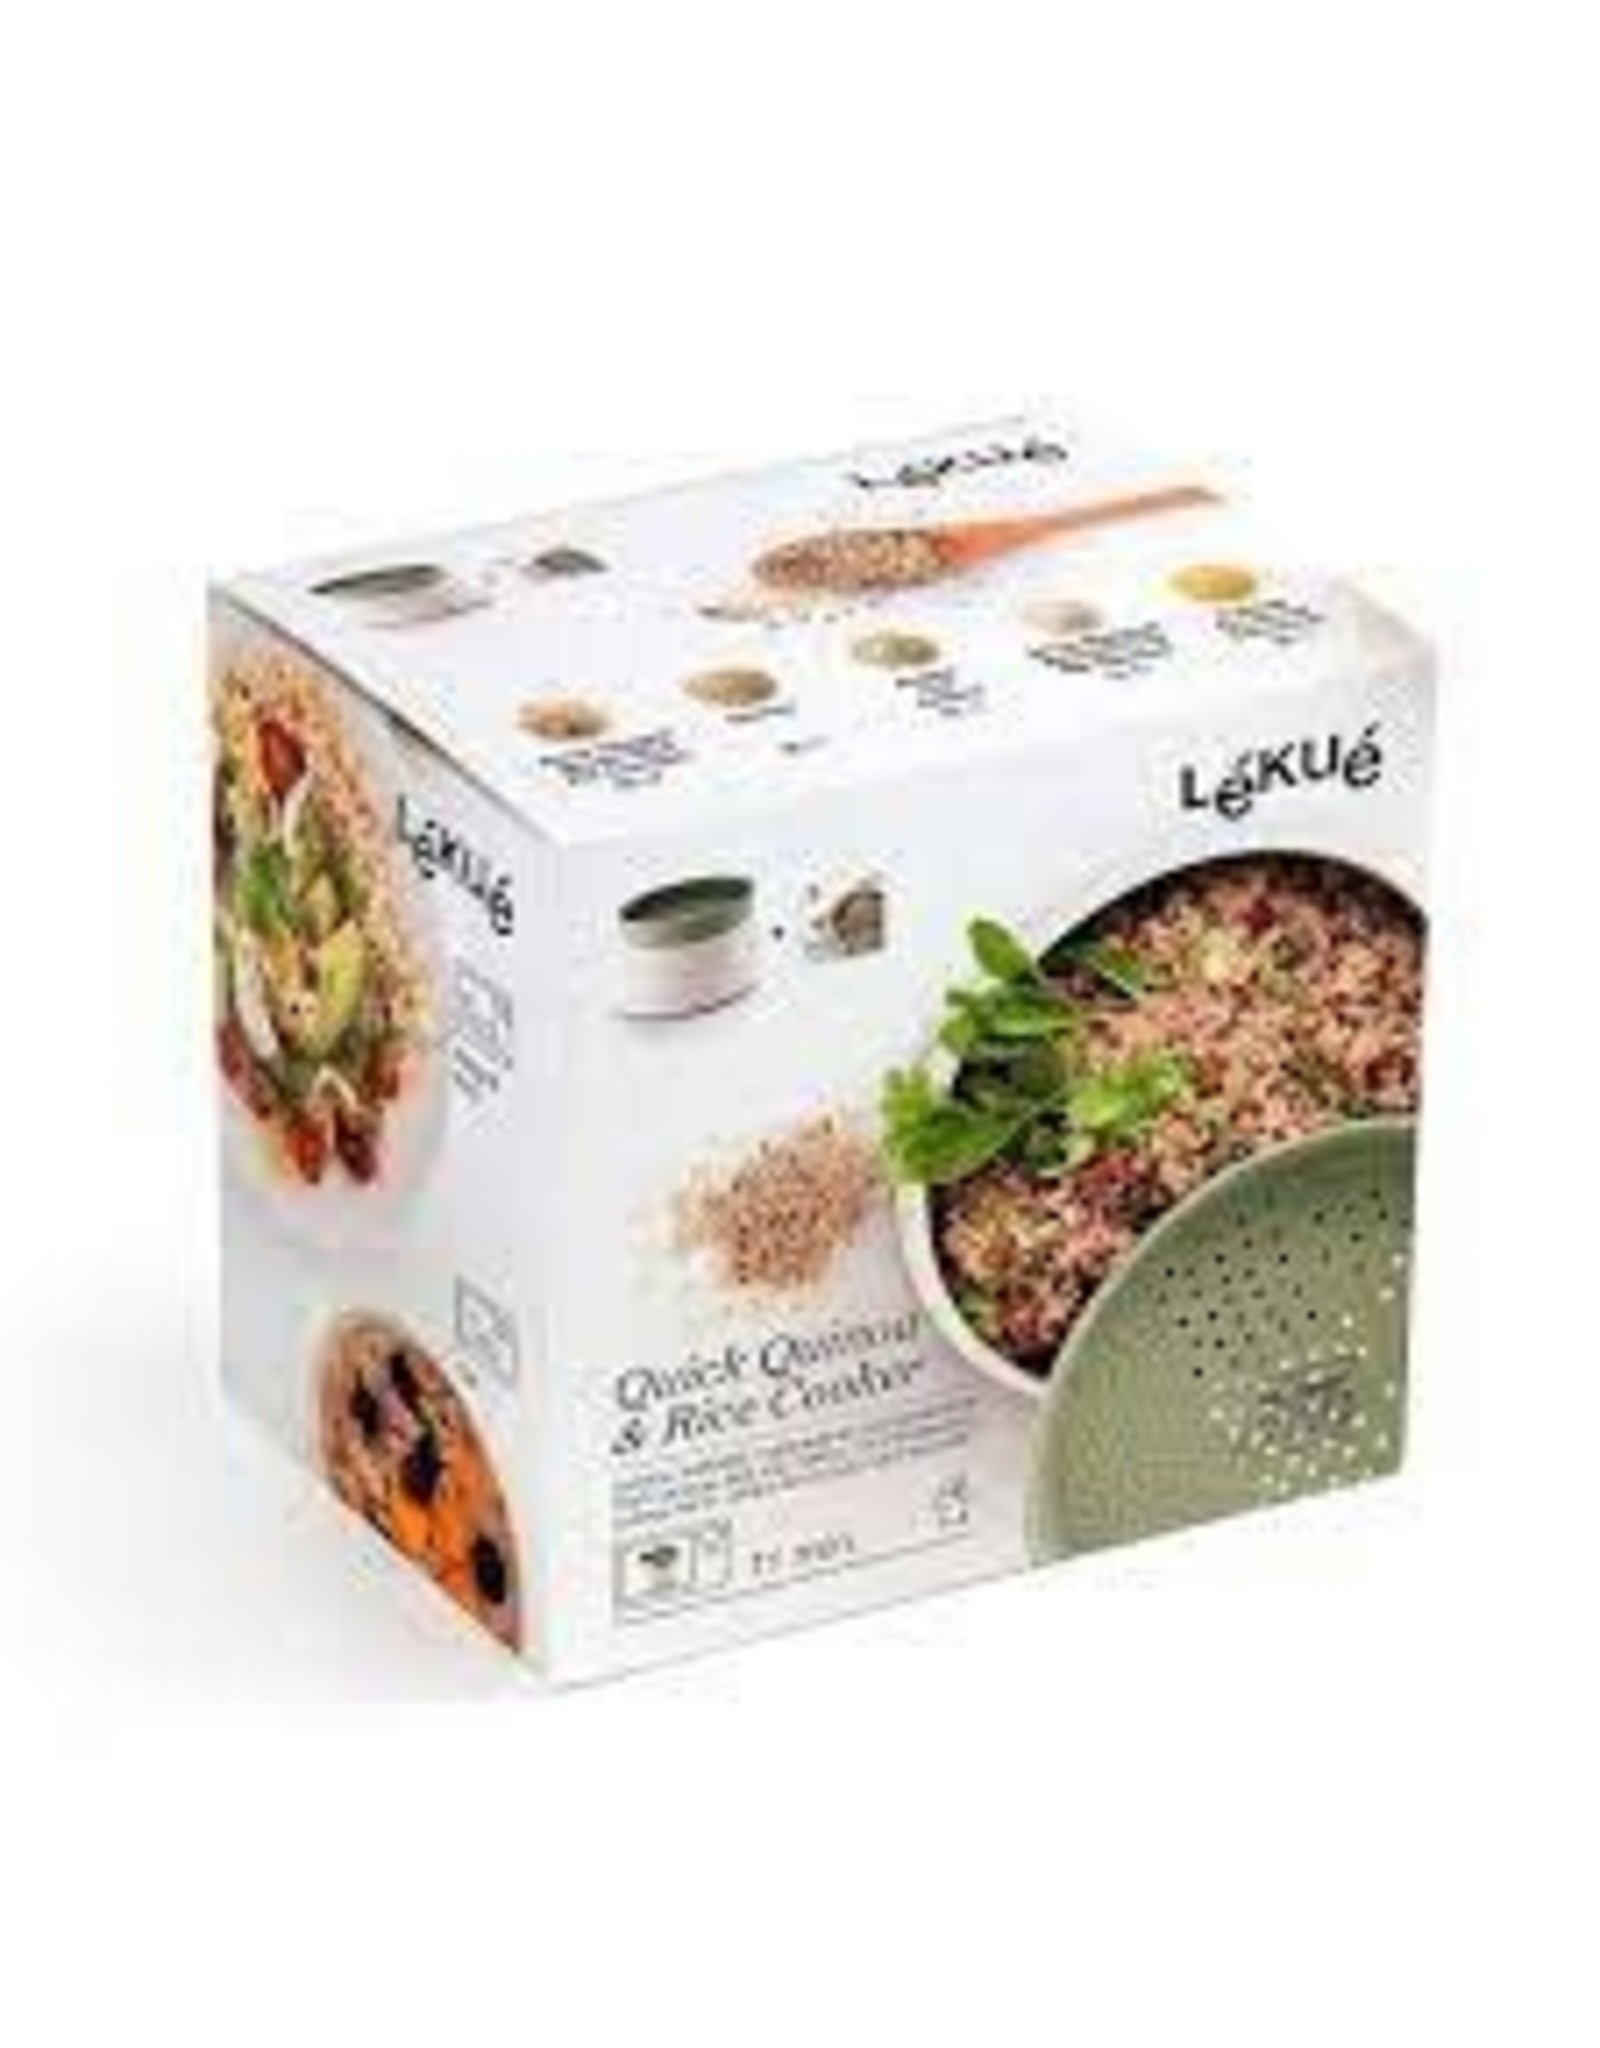 Lekue LEKUE Quick Quinoa Rice Cooker